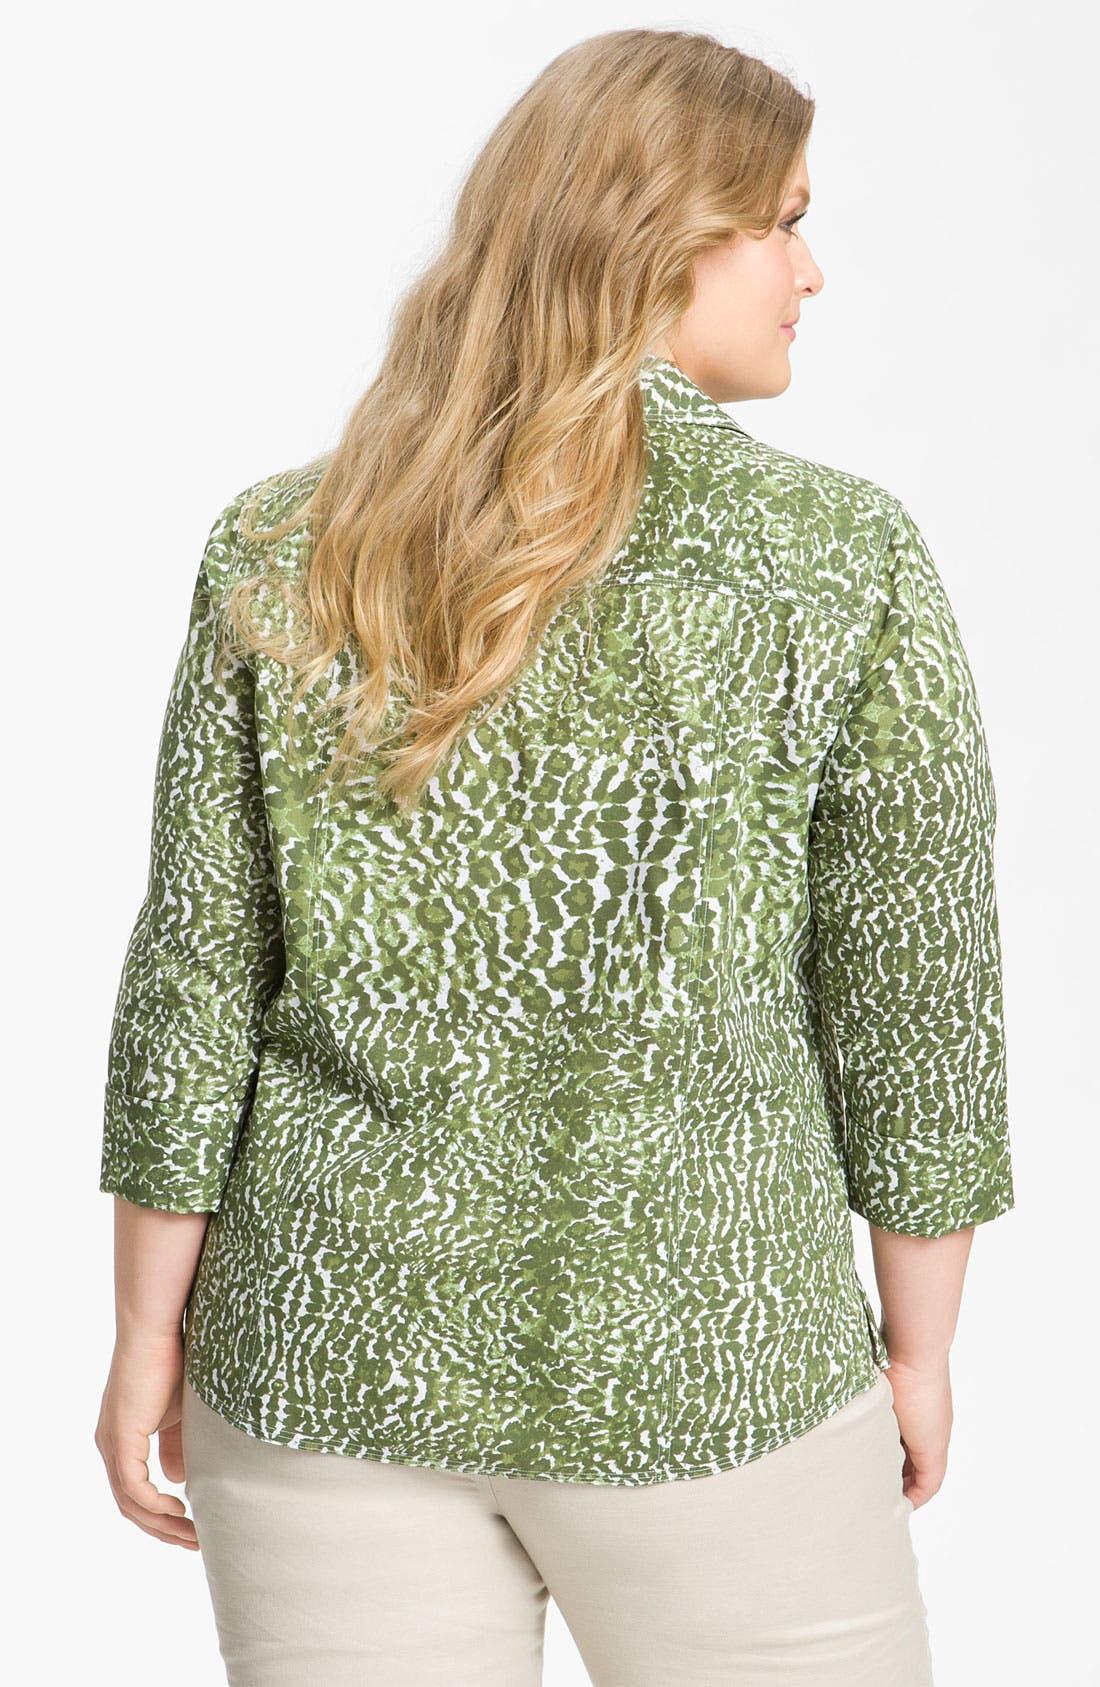 Alternate Image 2  - Foxcroft Leopard Print Shaped Shirt (Plus)